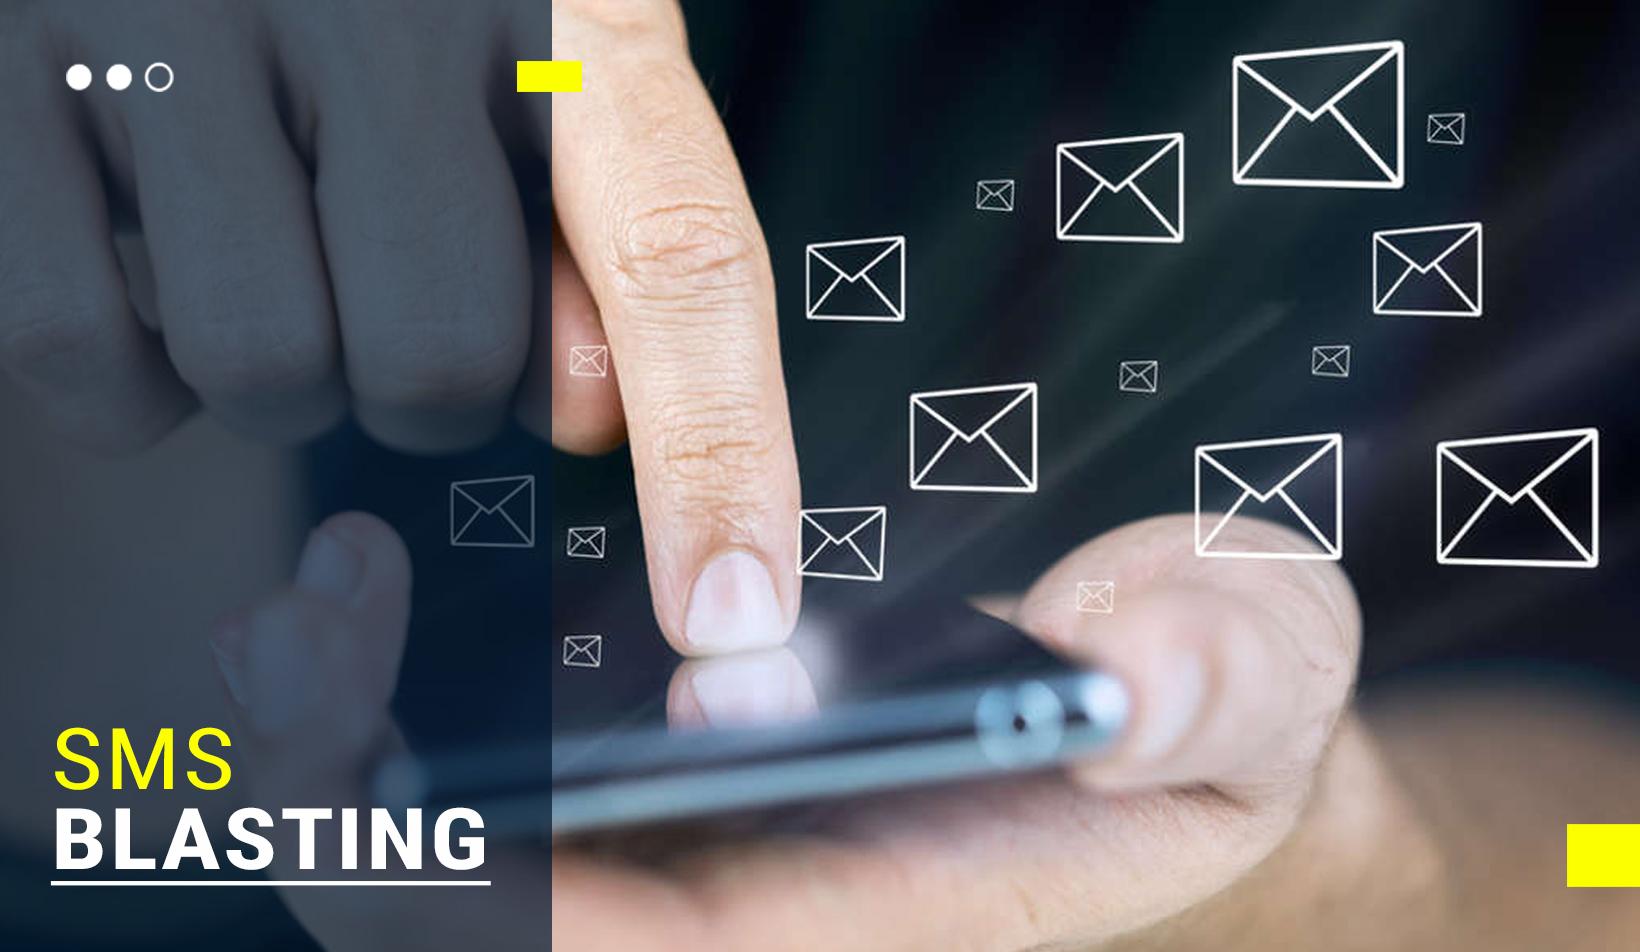 SMS Blasting